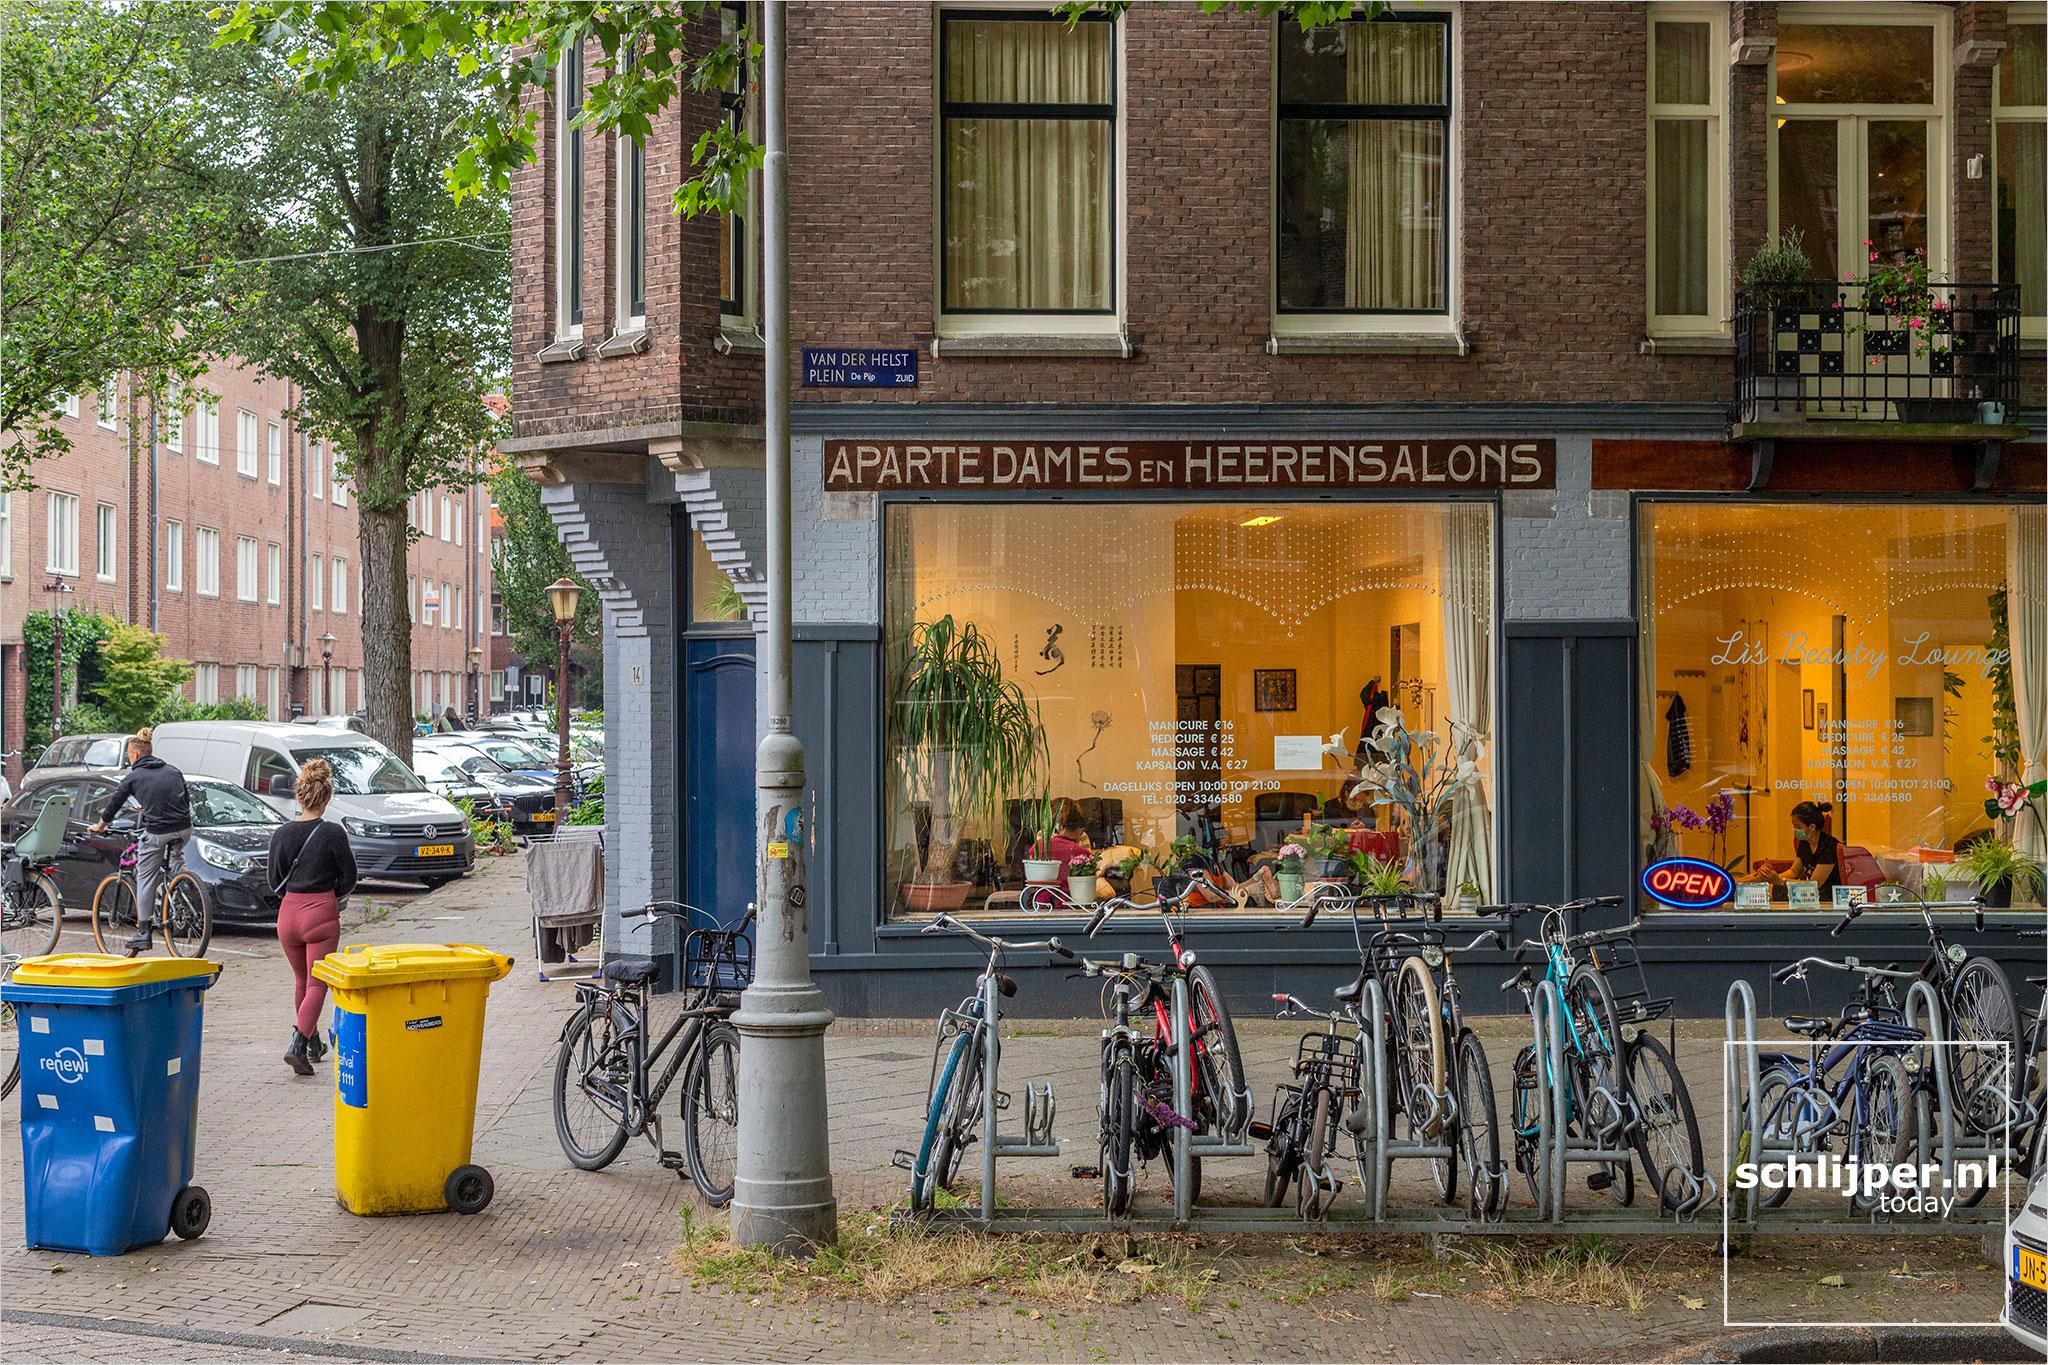 The Netherlands, Amsterdam, 12 juli 2021